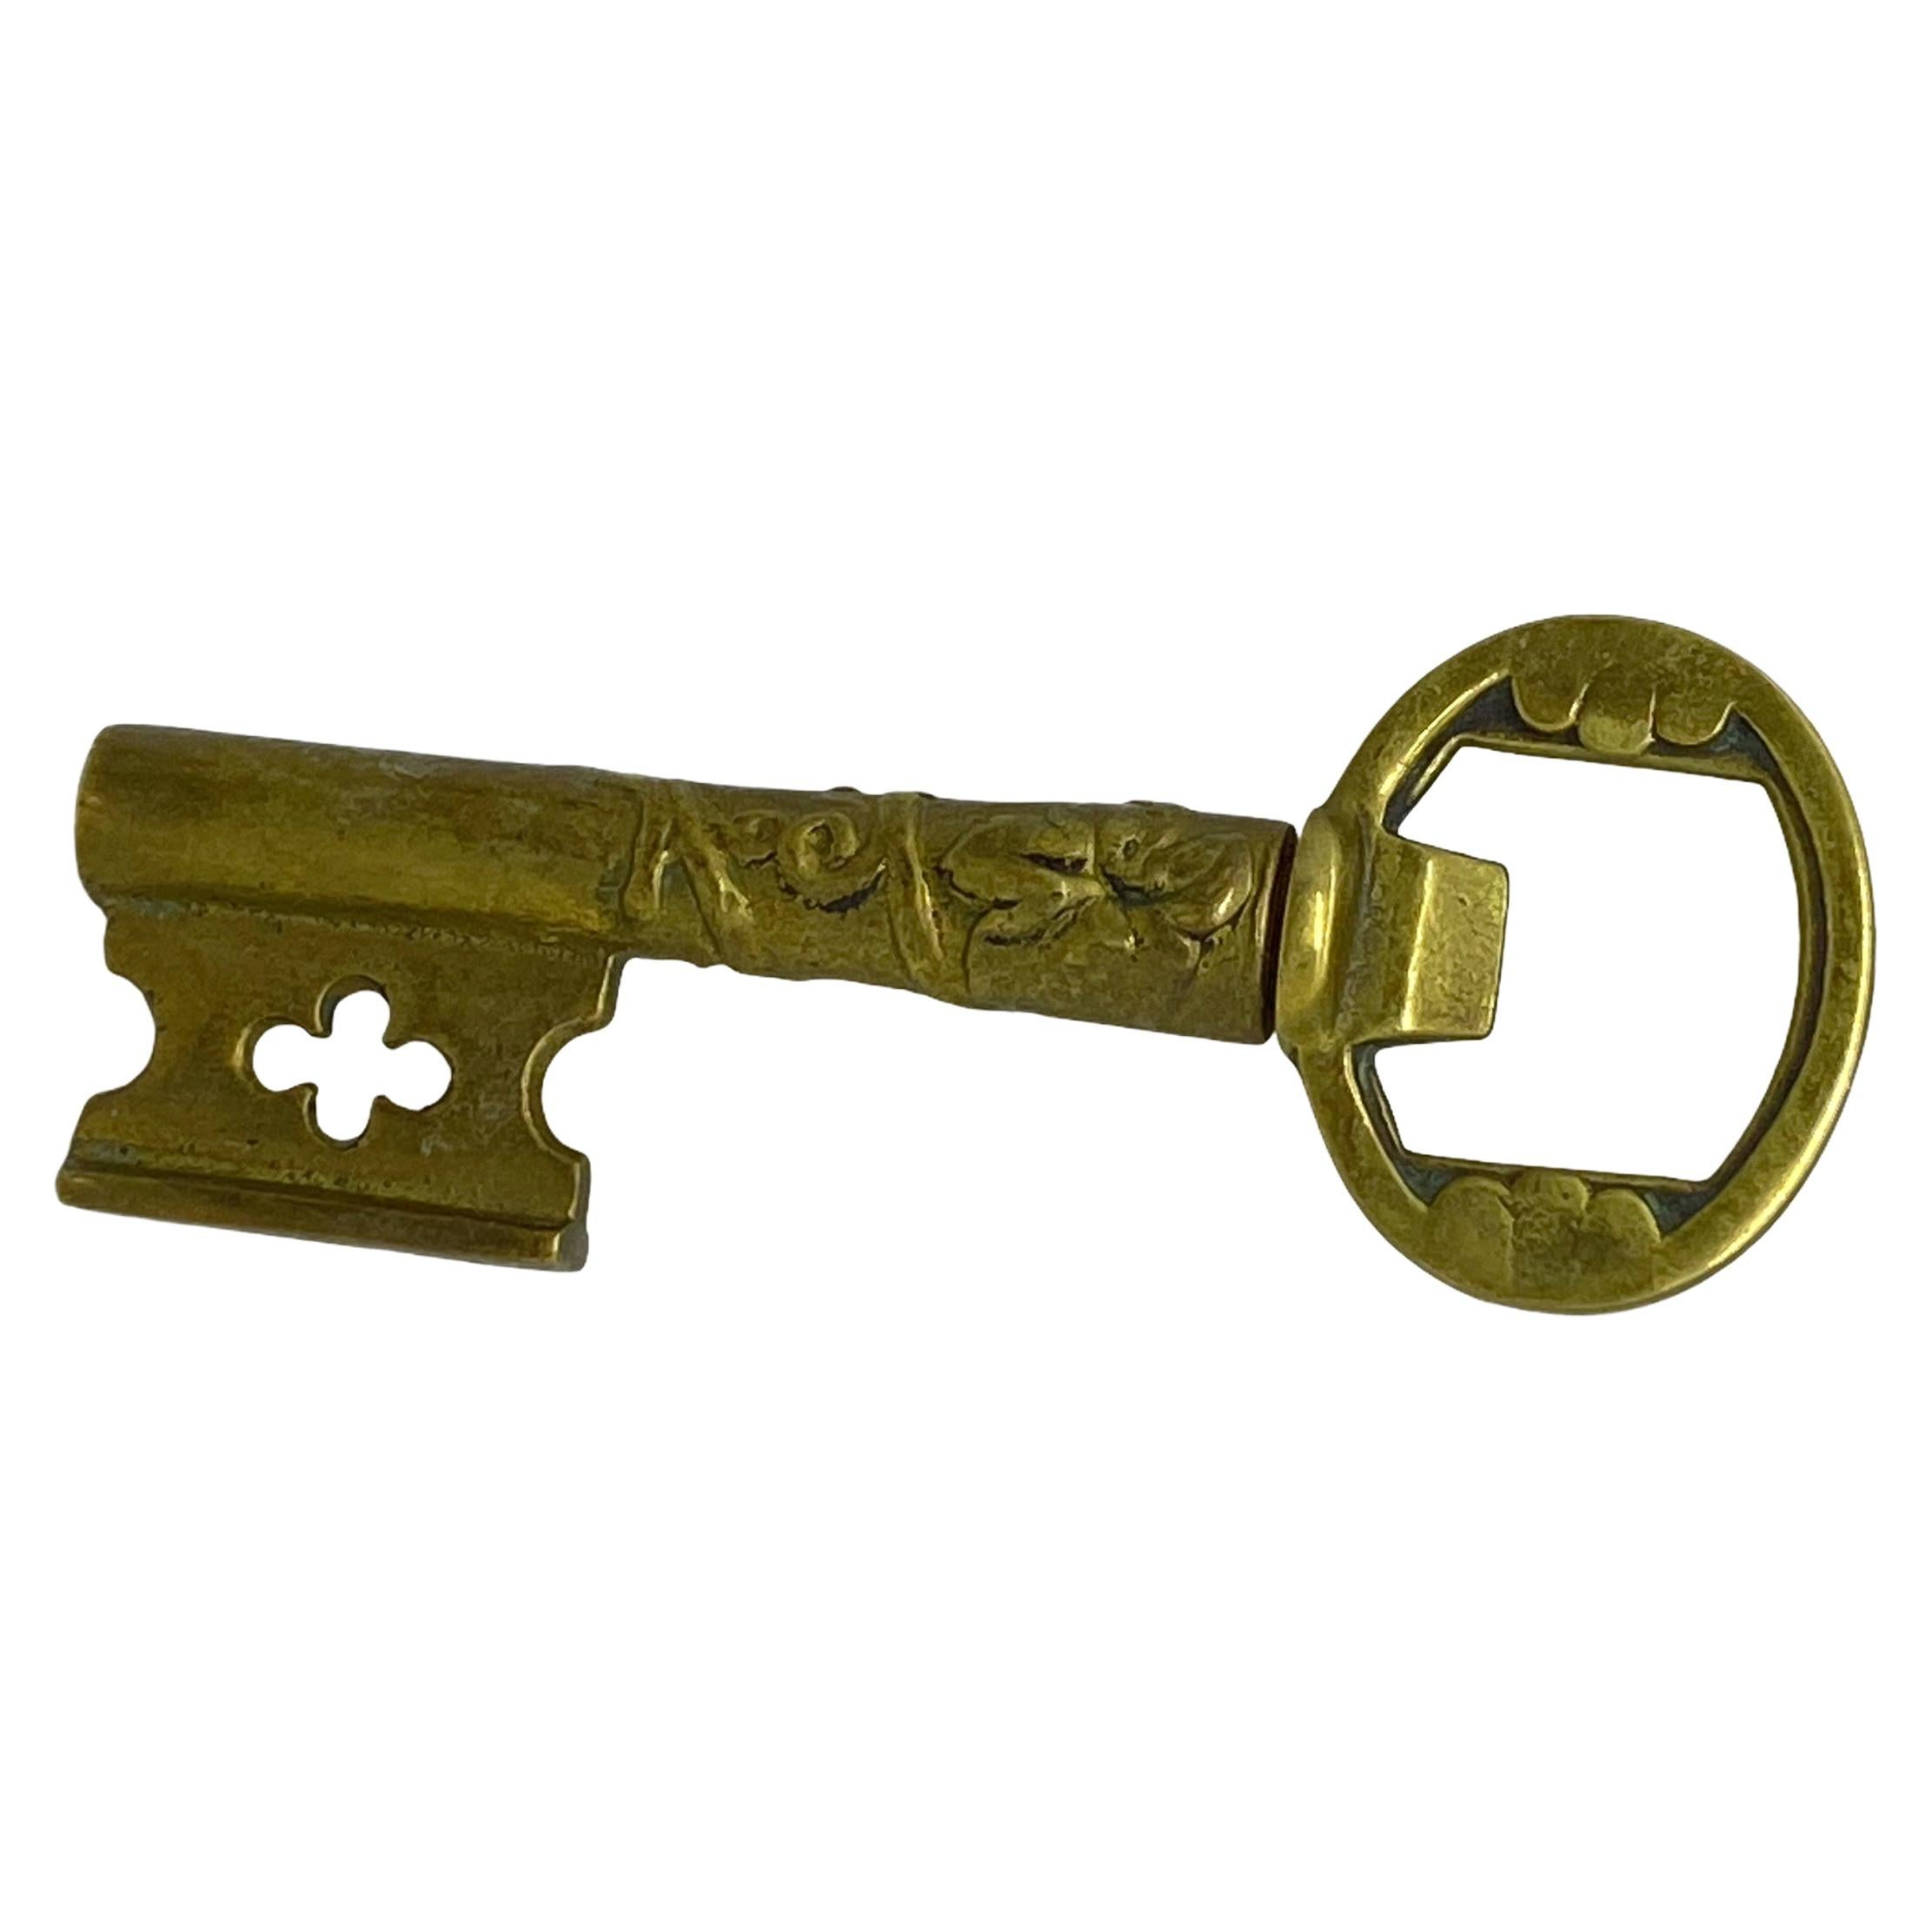 Vintage Brass Bronze Key Corkscrew and Bottle Opener Metal Breweriana Barware